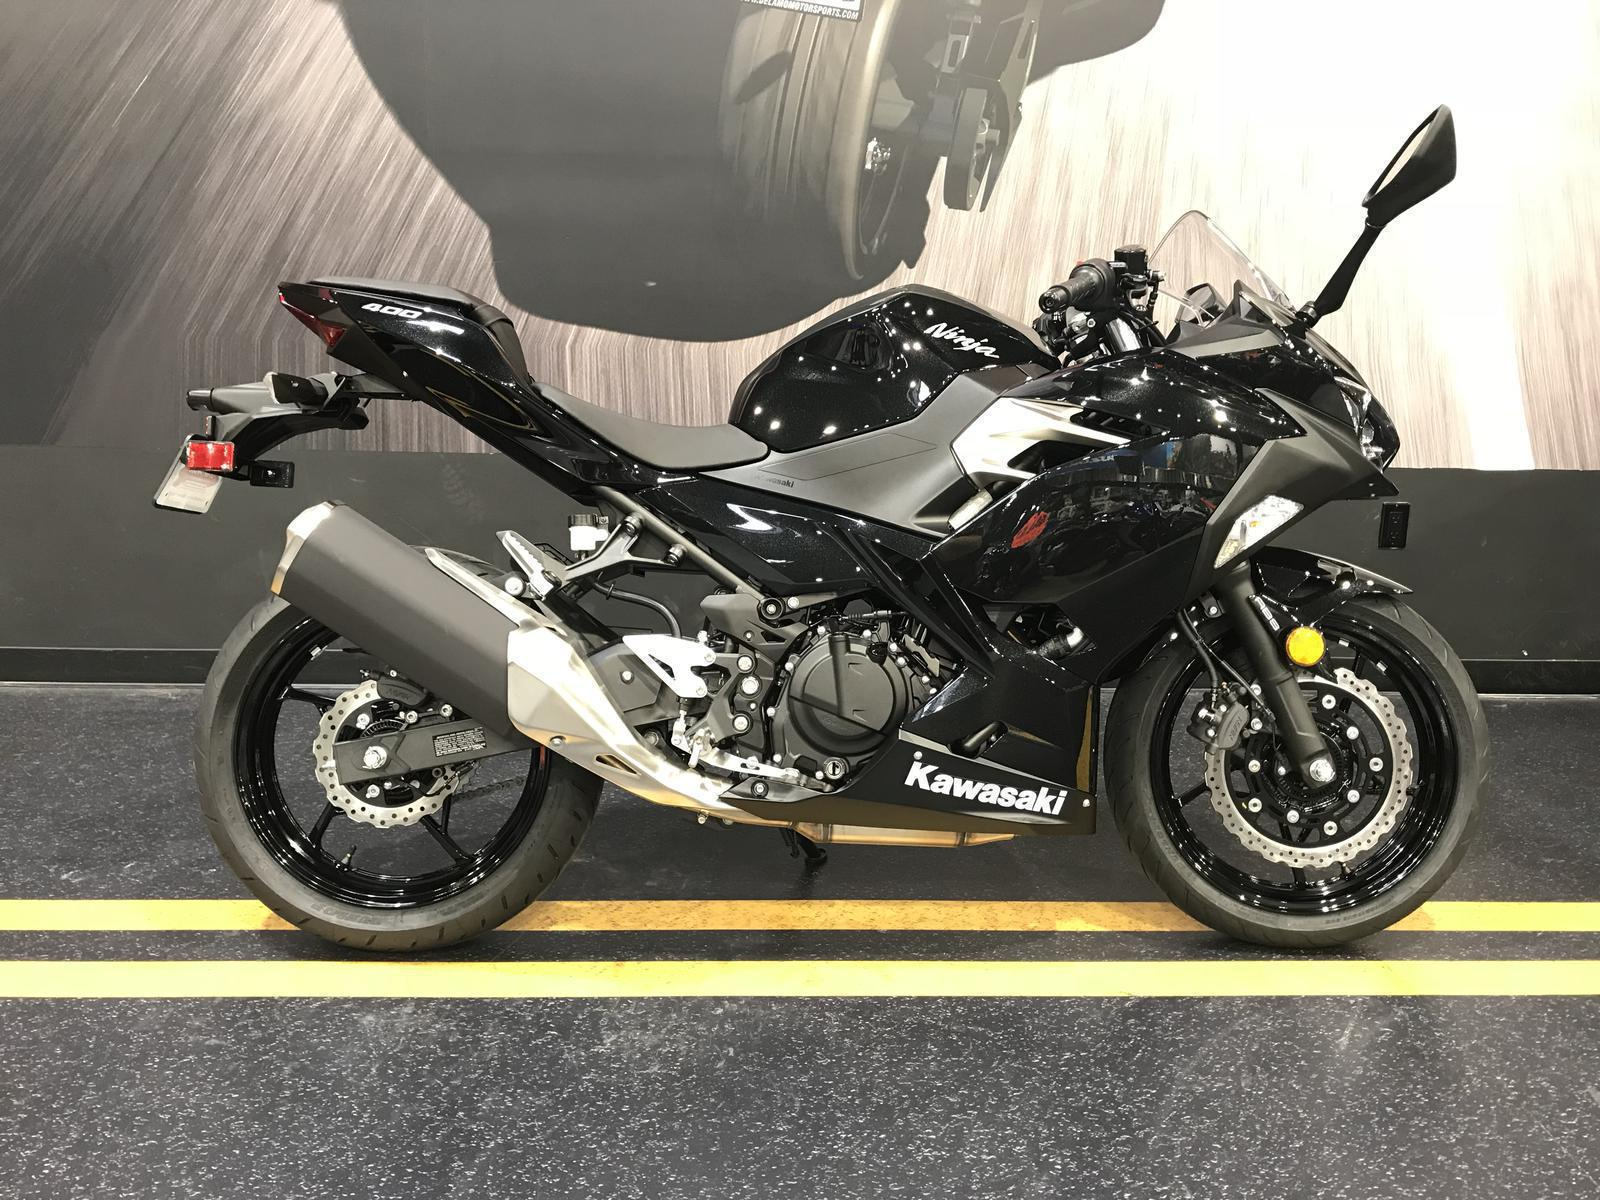 2018 Kawasaki Ninja 400 Abs For Sale In Chula Vista Ca Del Amo